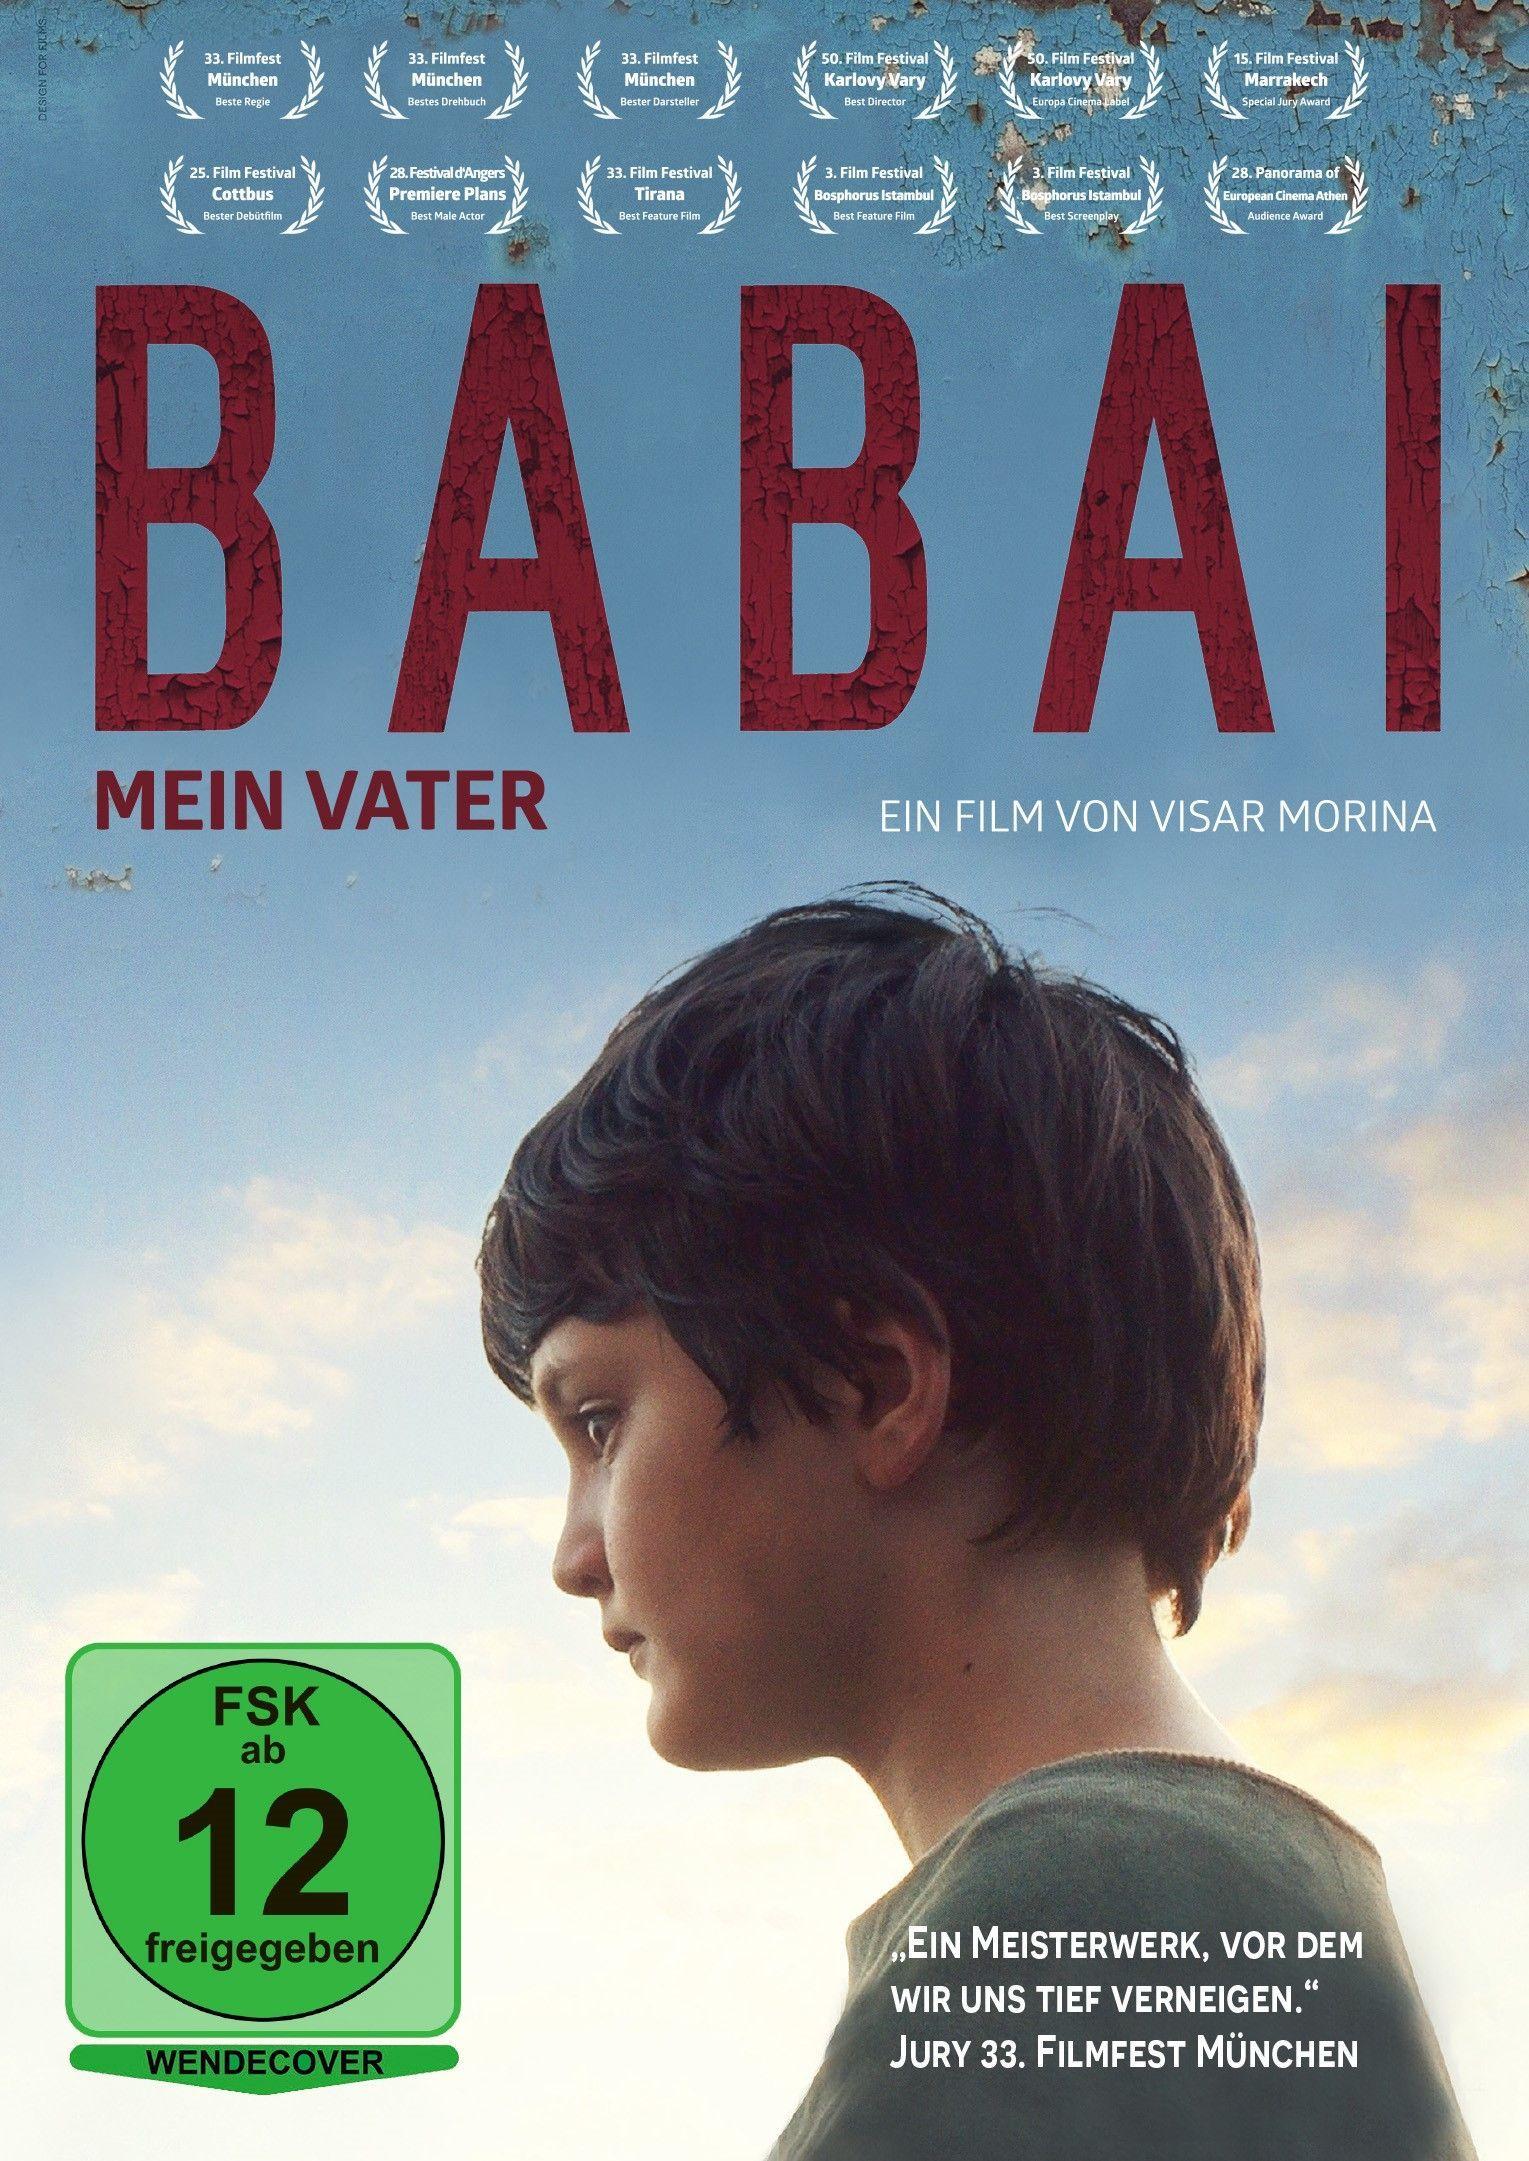 Image of Babai